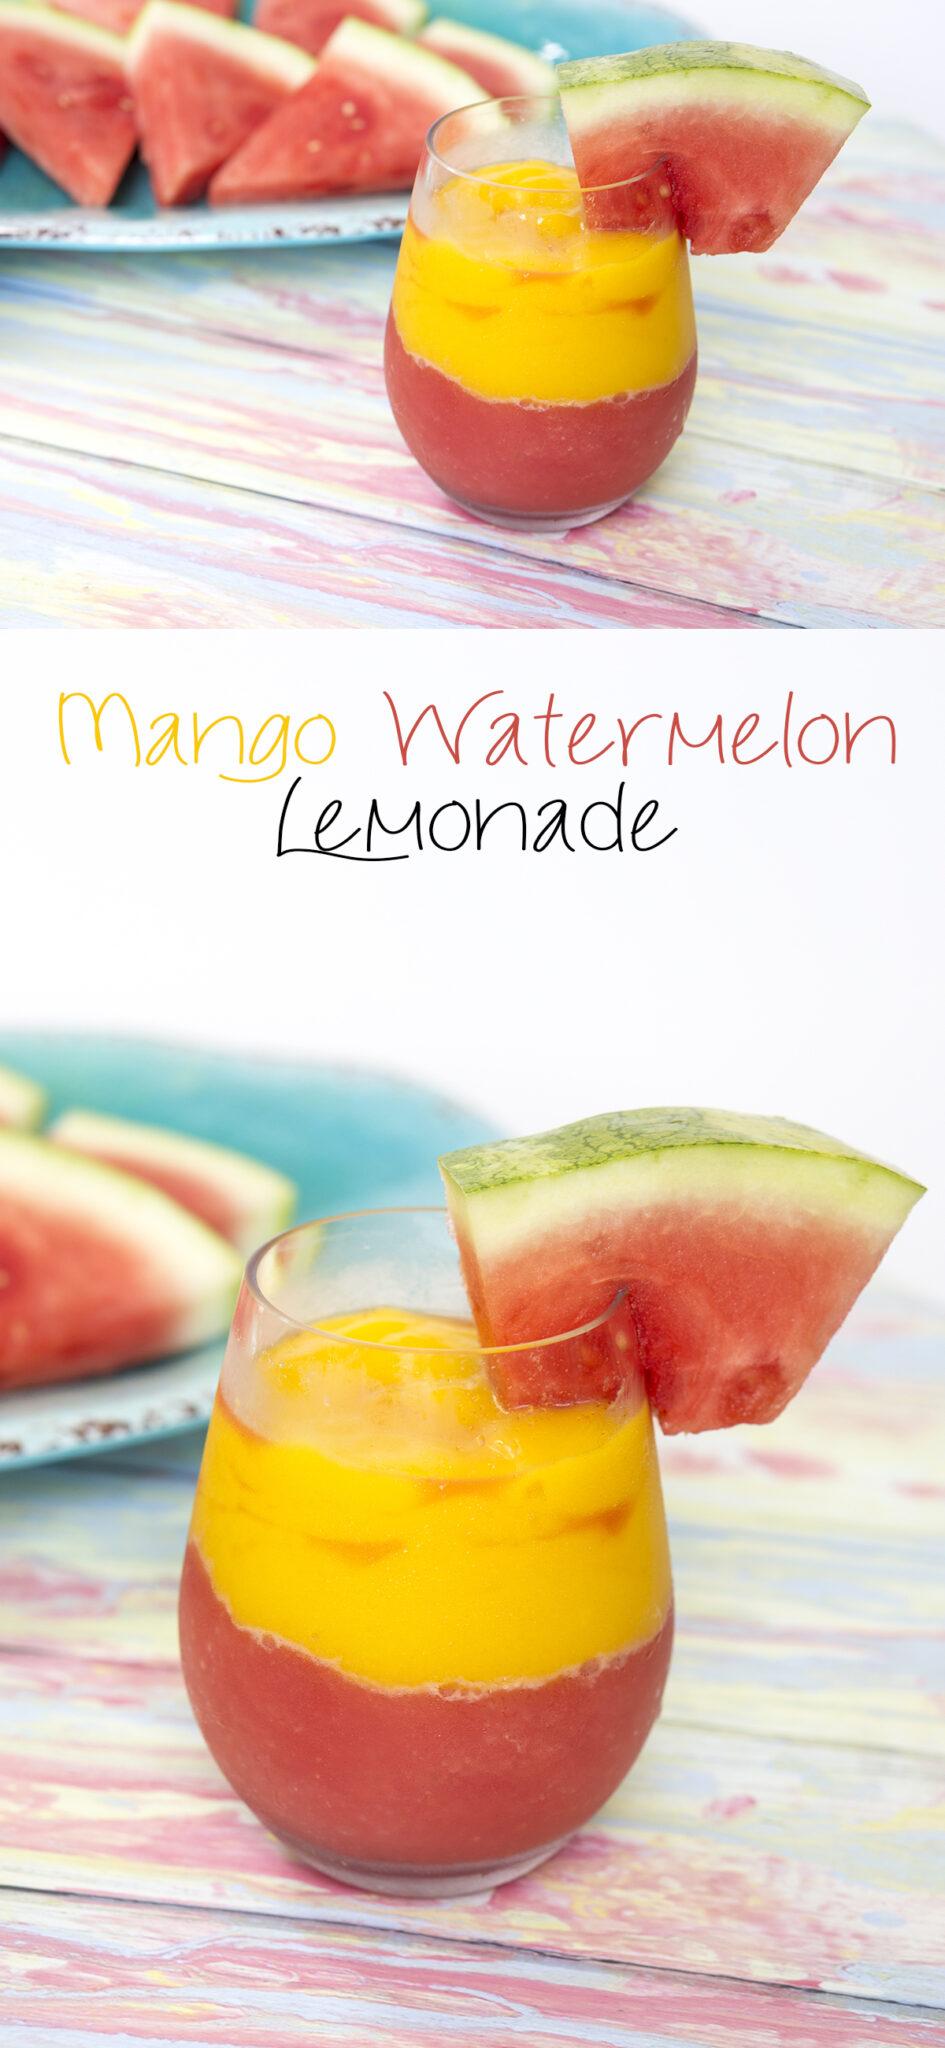 Frozen Mango Watermelon Lemonade